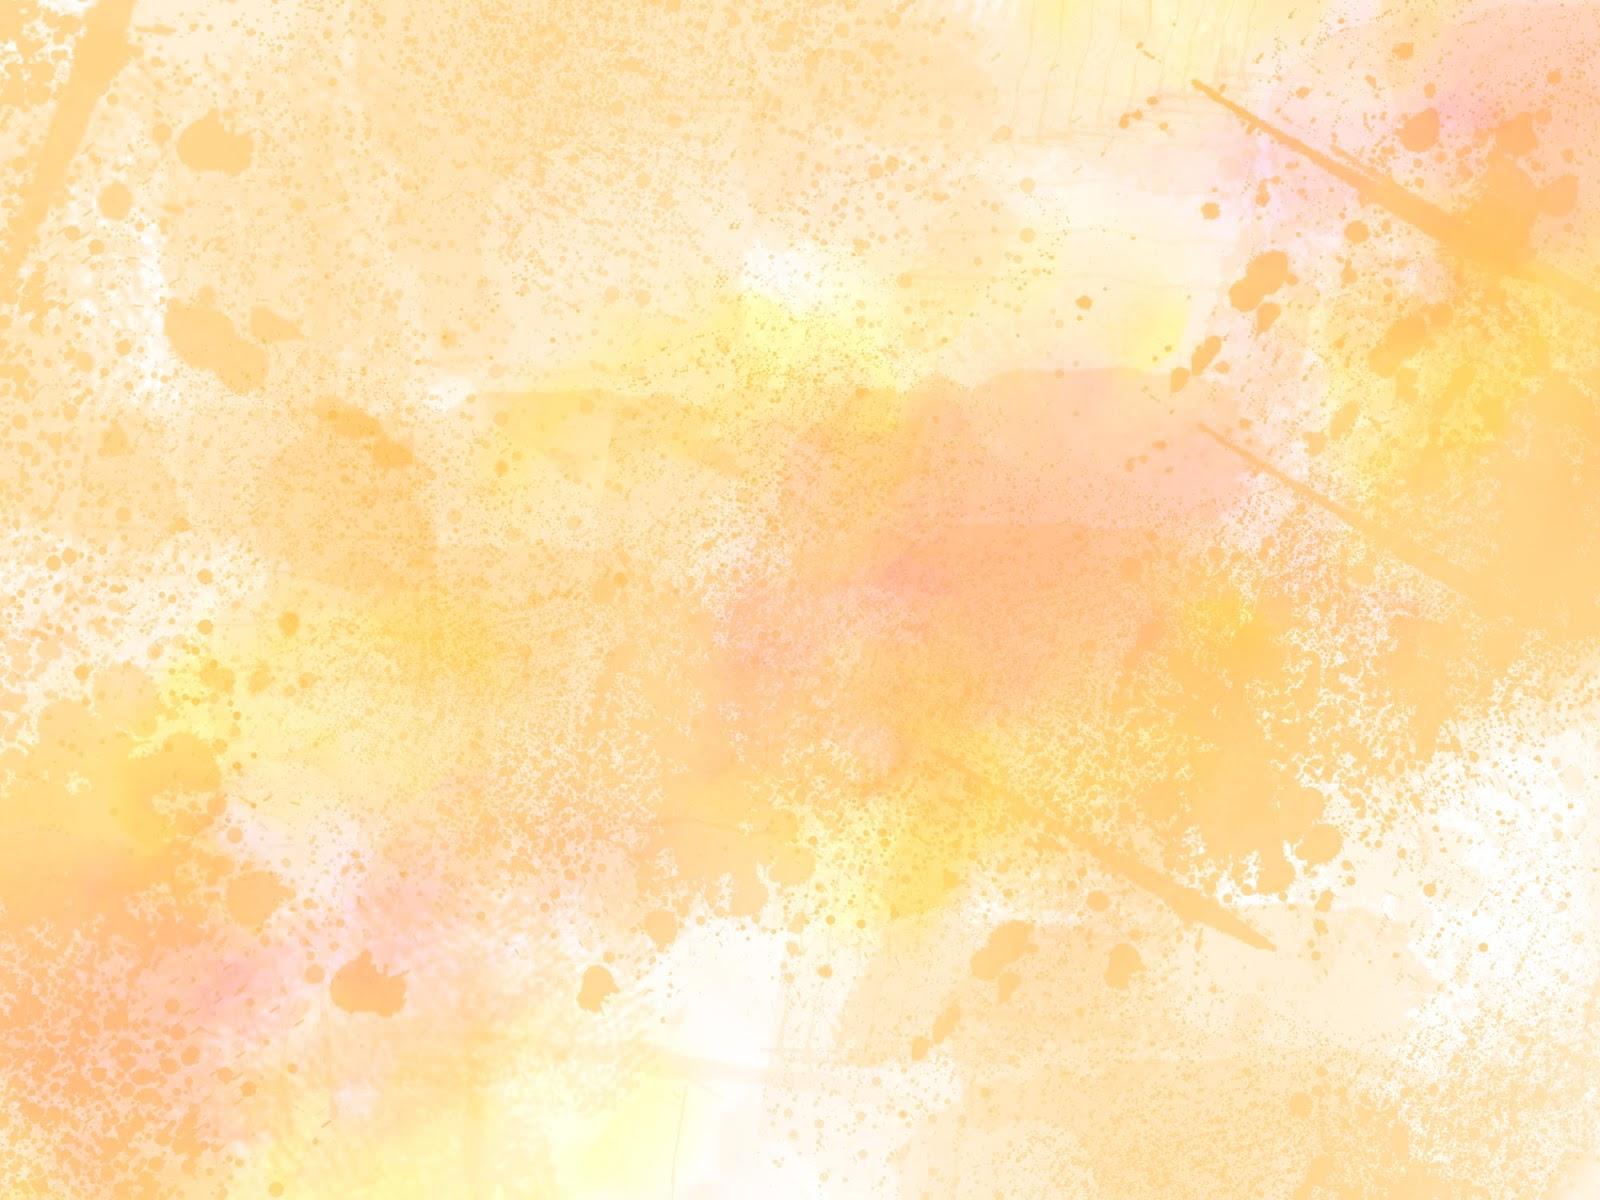 Pastel Backgrounds Quotes QuotesGram 1600x1200